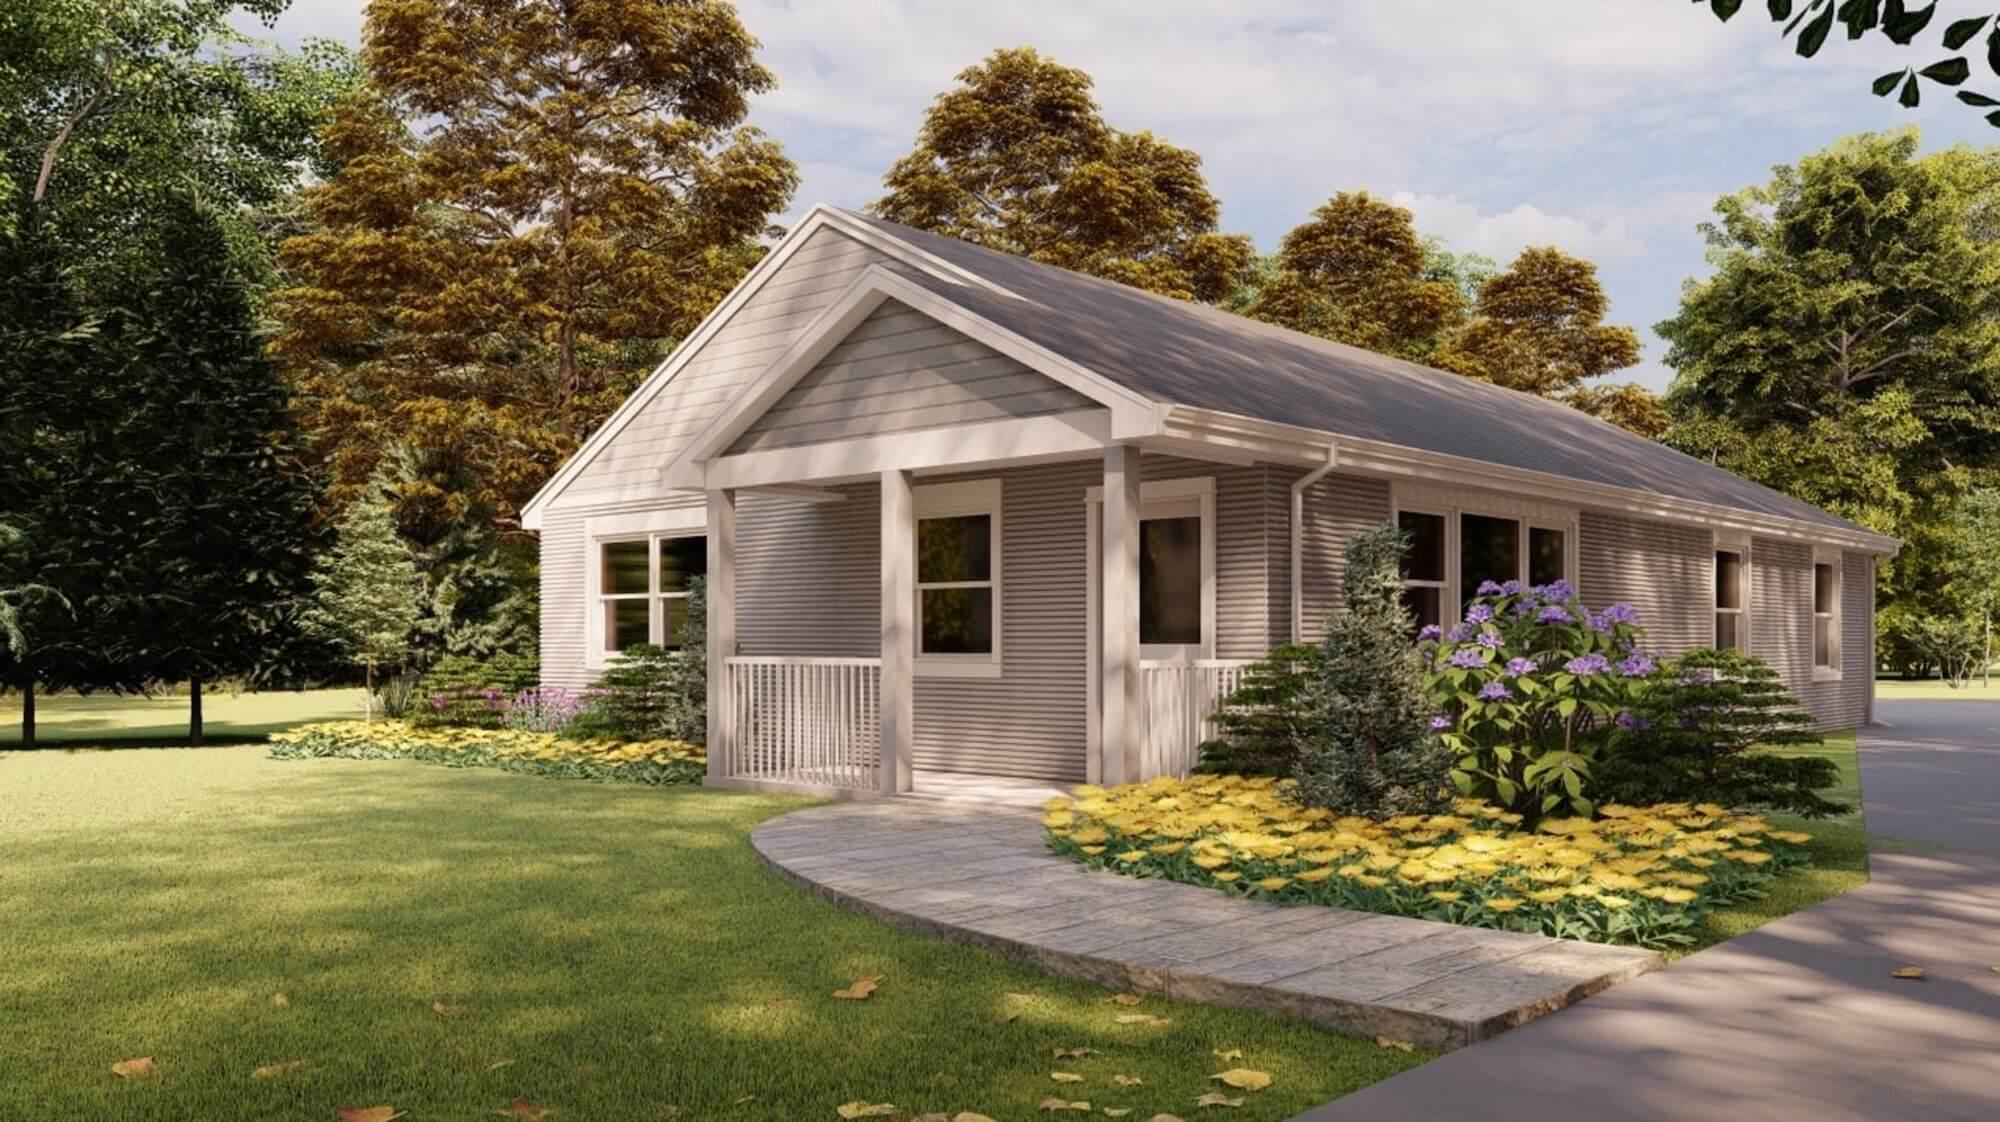 a modest suburban home